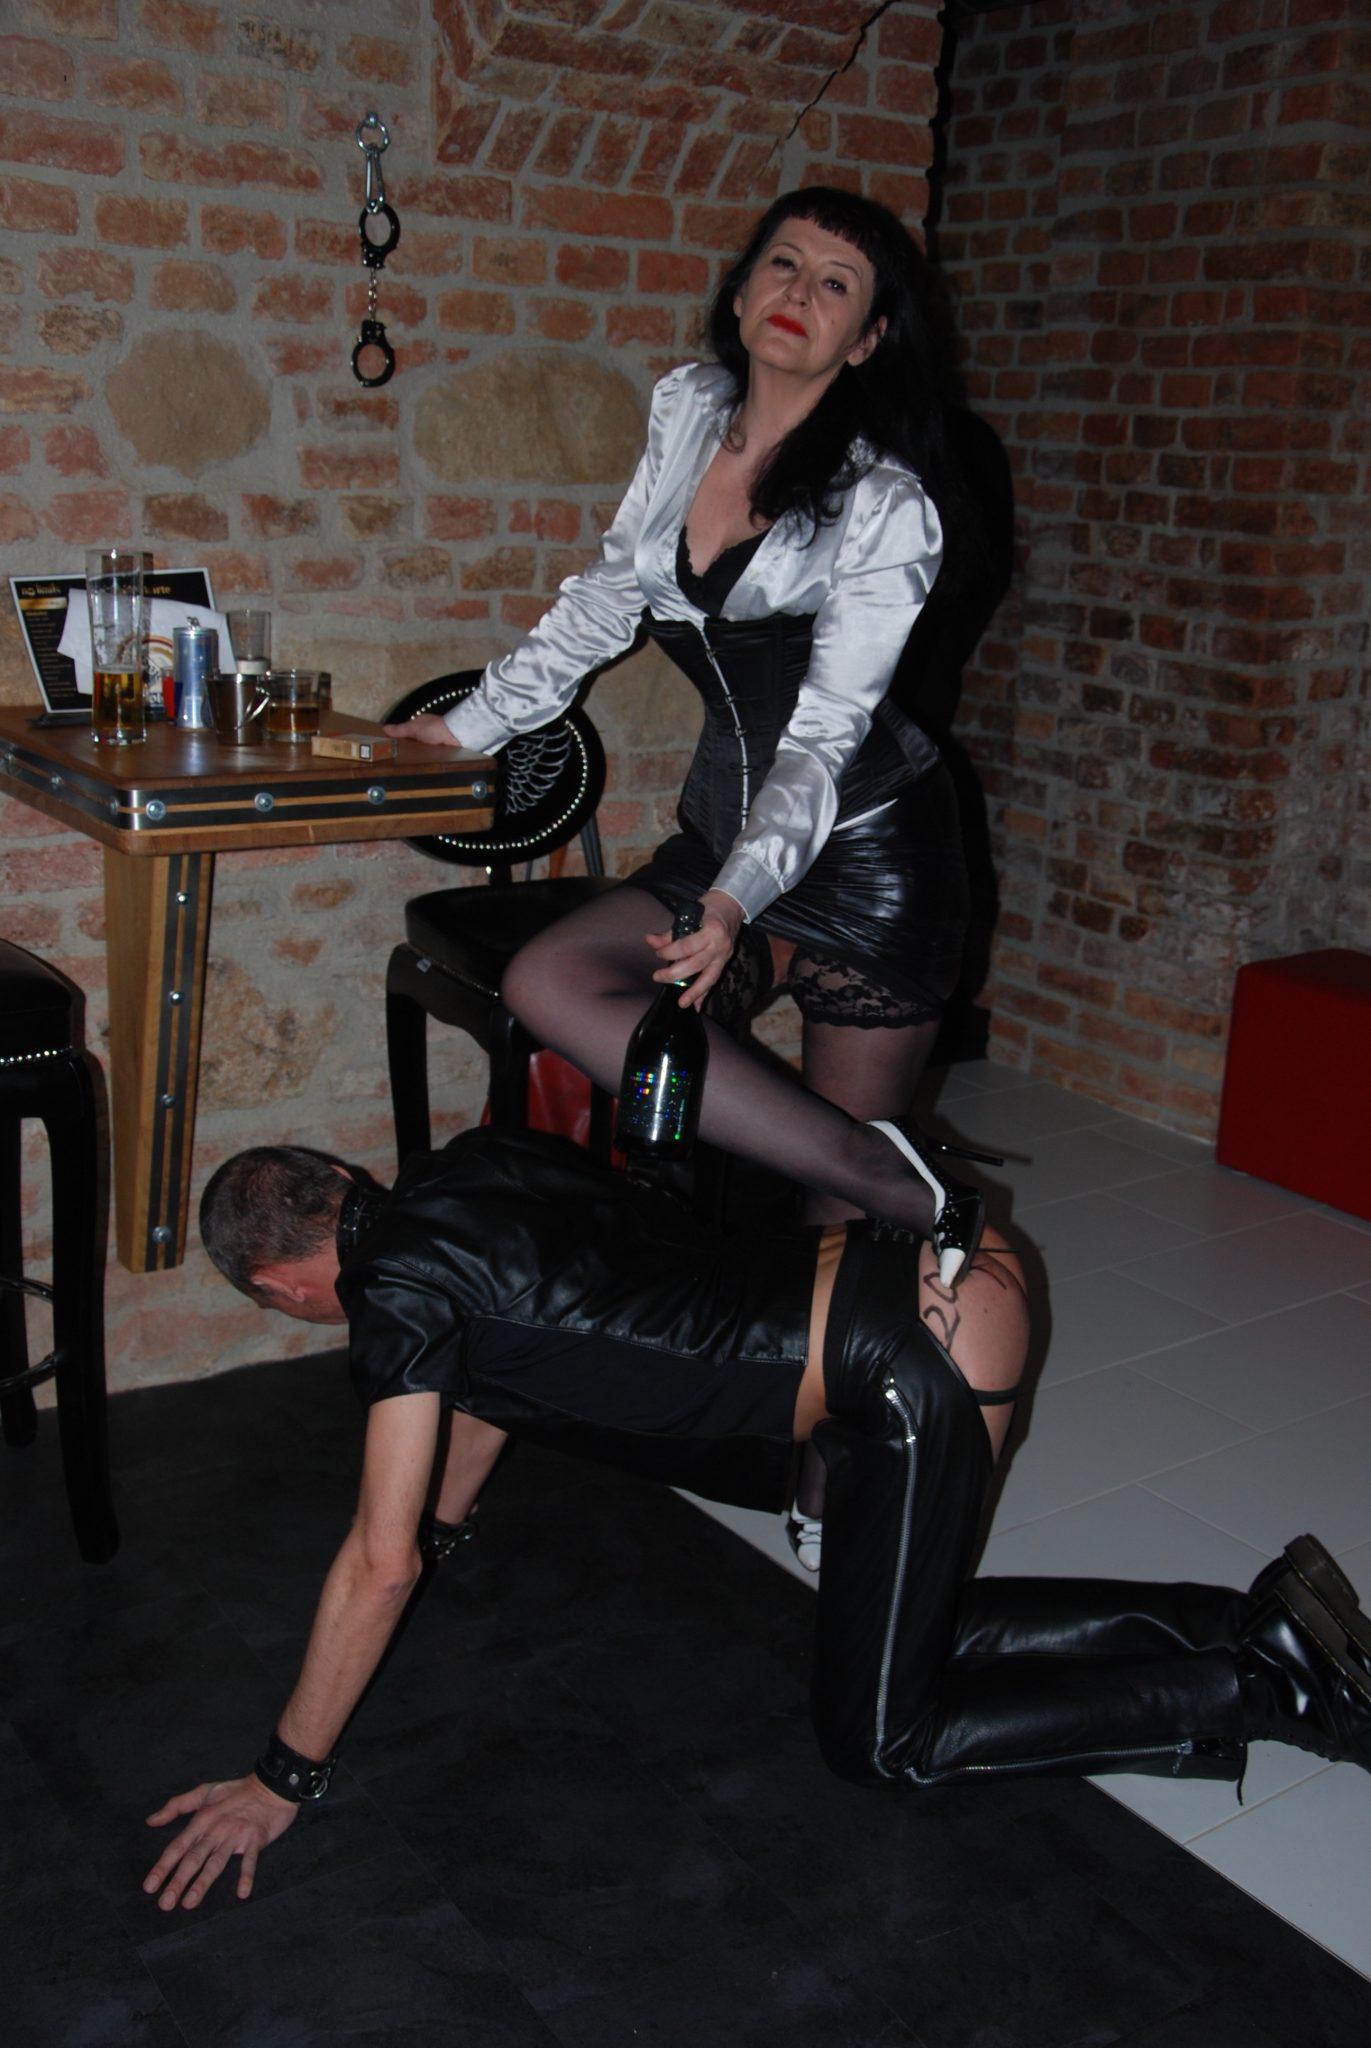 gute deutsche pornos swingerclub düren